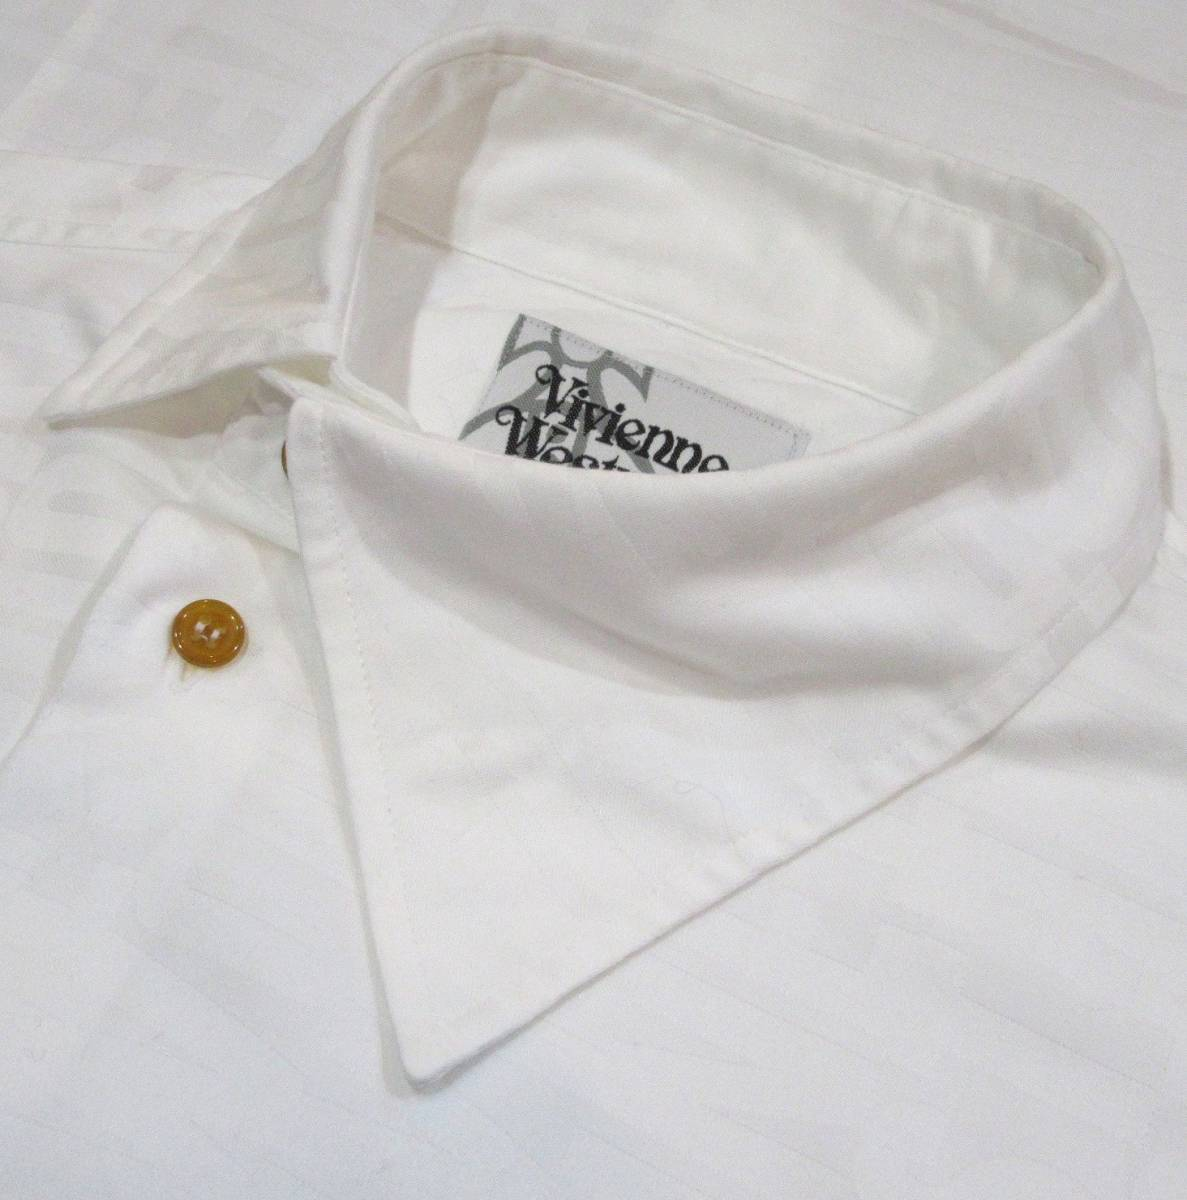 Vivienne Westwood MAN ロゴ総柄 オジークラークシャツ アシンメトリー コットン ブラウス 白 ORB刺繍 オーブ_画像3